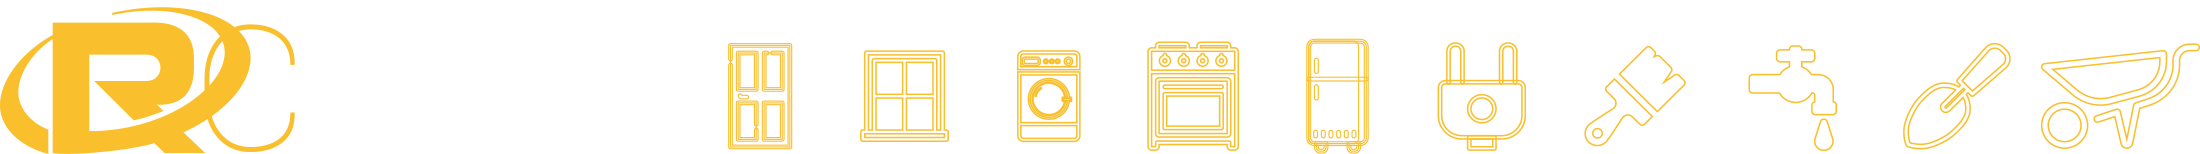 reparation et construction   Retina Logo